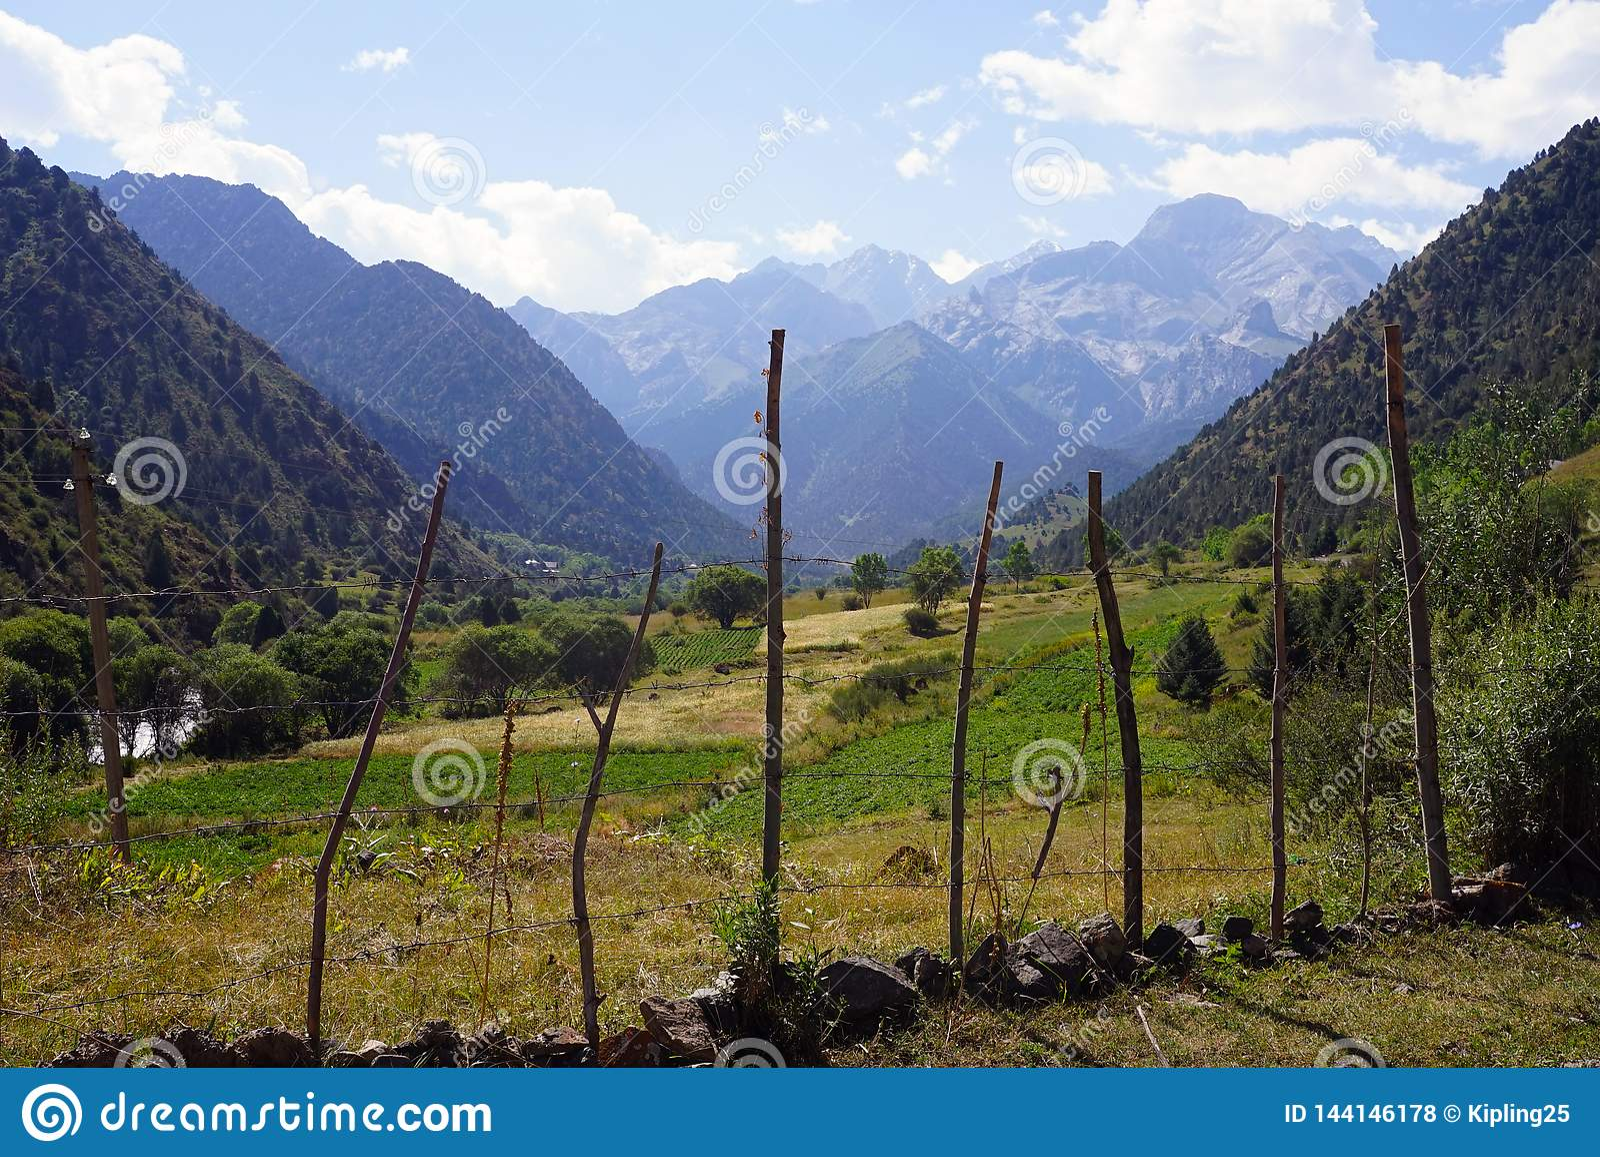 Gebirgstal nahe Kyrgyz Ata National Park, Kirgisistan